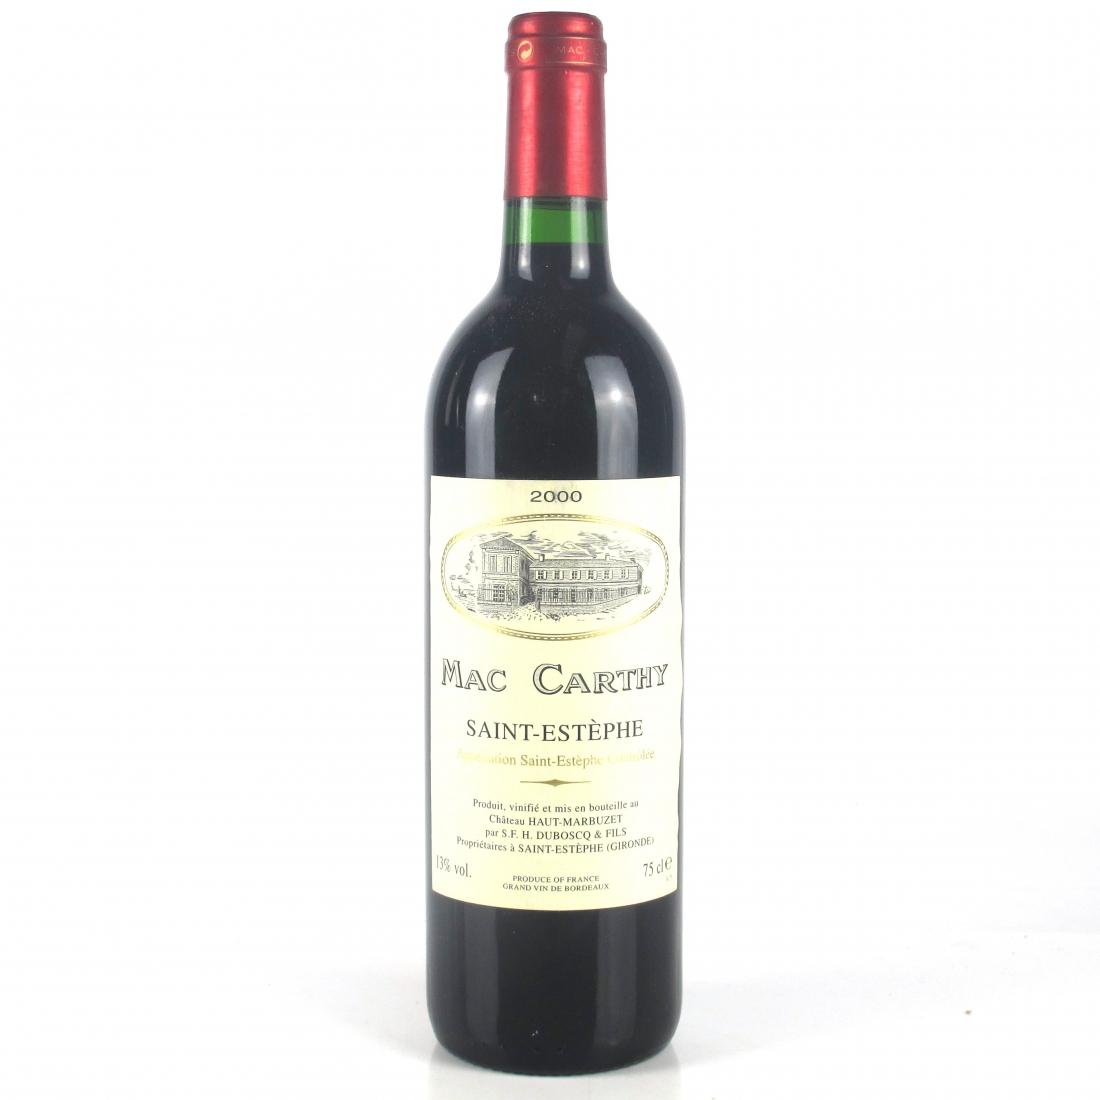 Mac Carthy 2000 Saint-Estephe